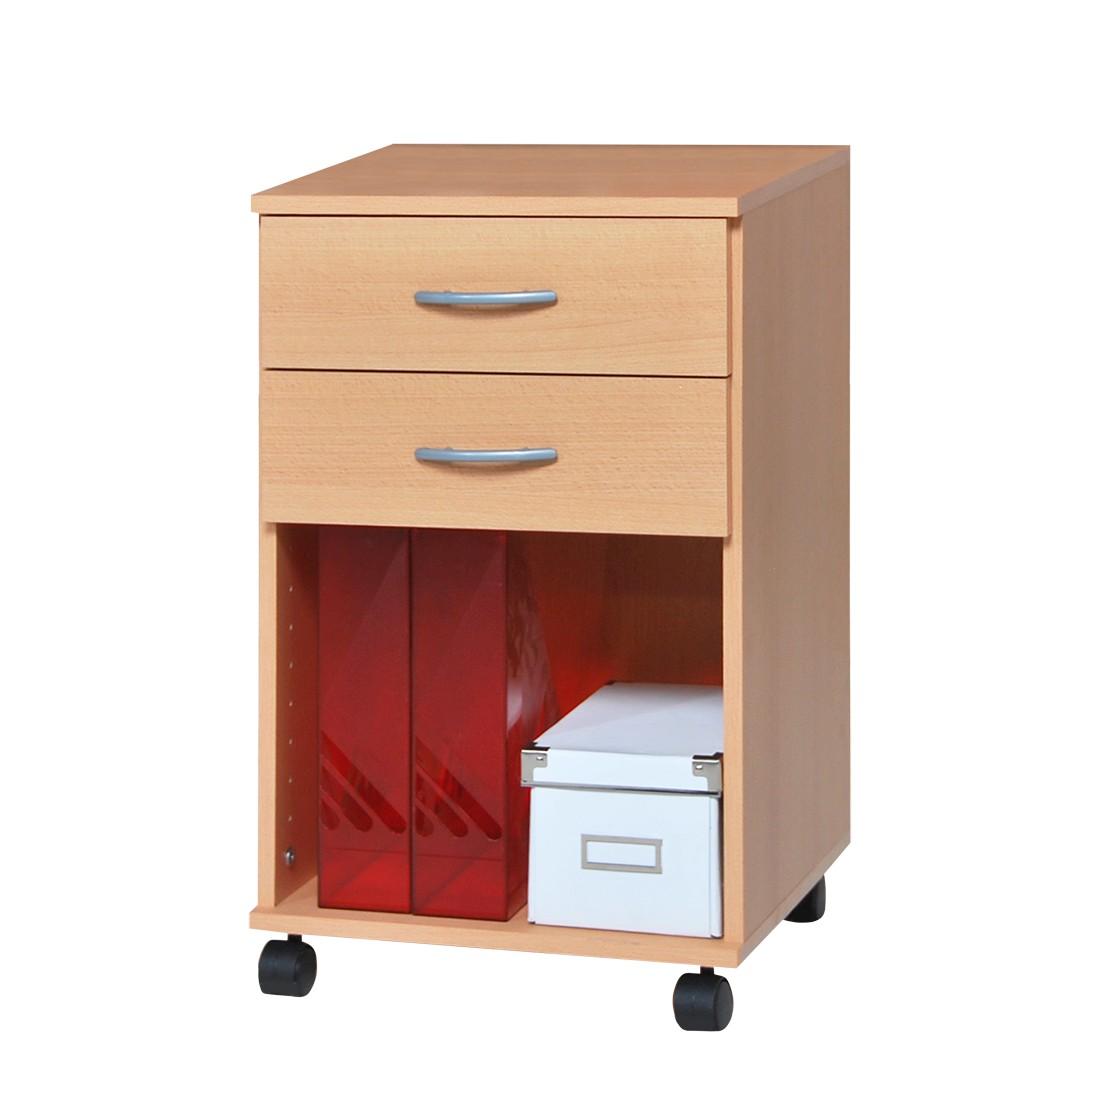 home24 Rollcontainer Mark   Büro > Büroschränke > Rollcontainer   Beige   Holzwerkstoff   home24office